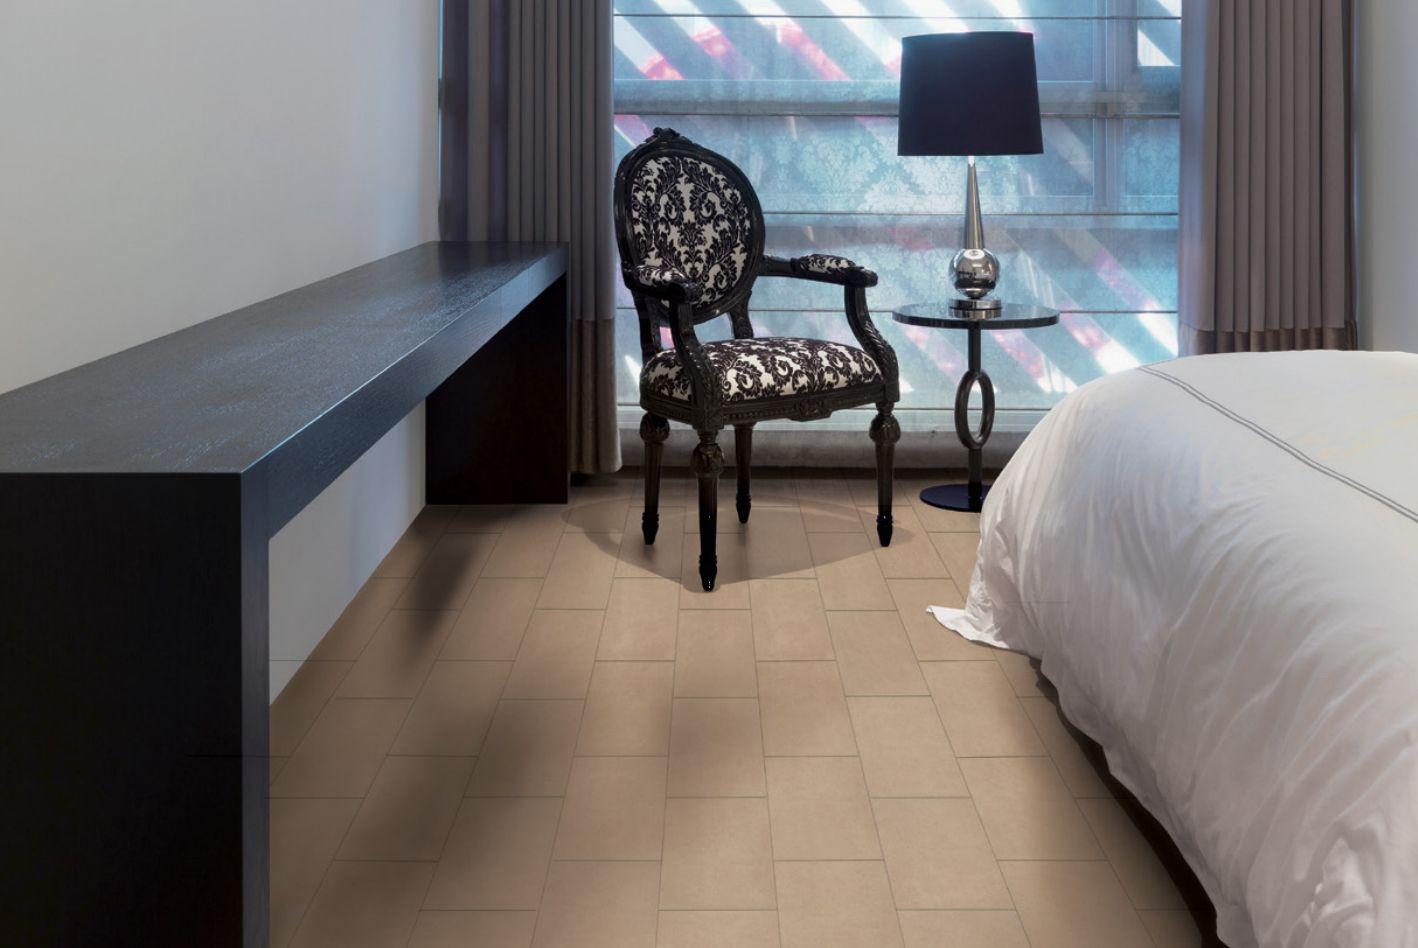 12 x 24 Infinite Brown Tile In a Bedroom